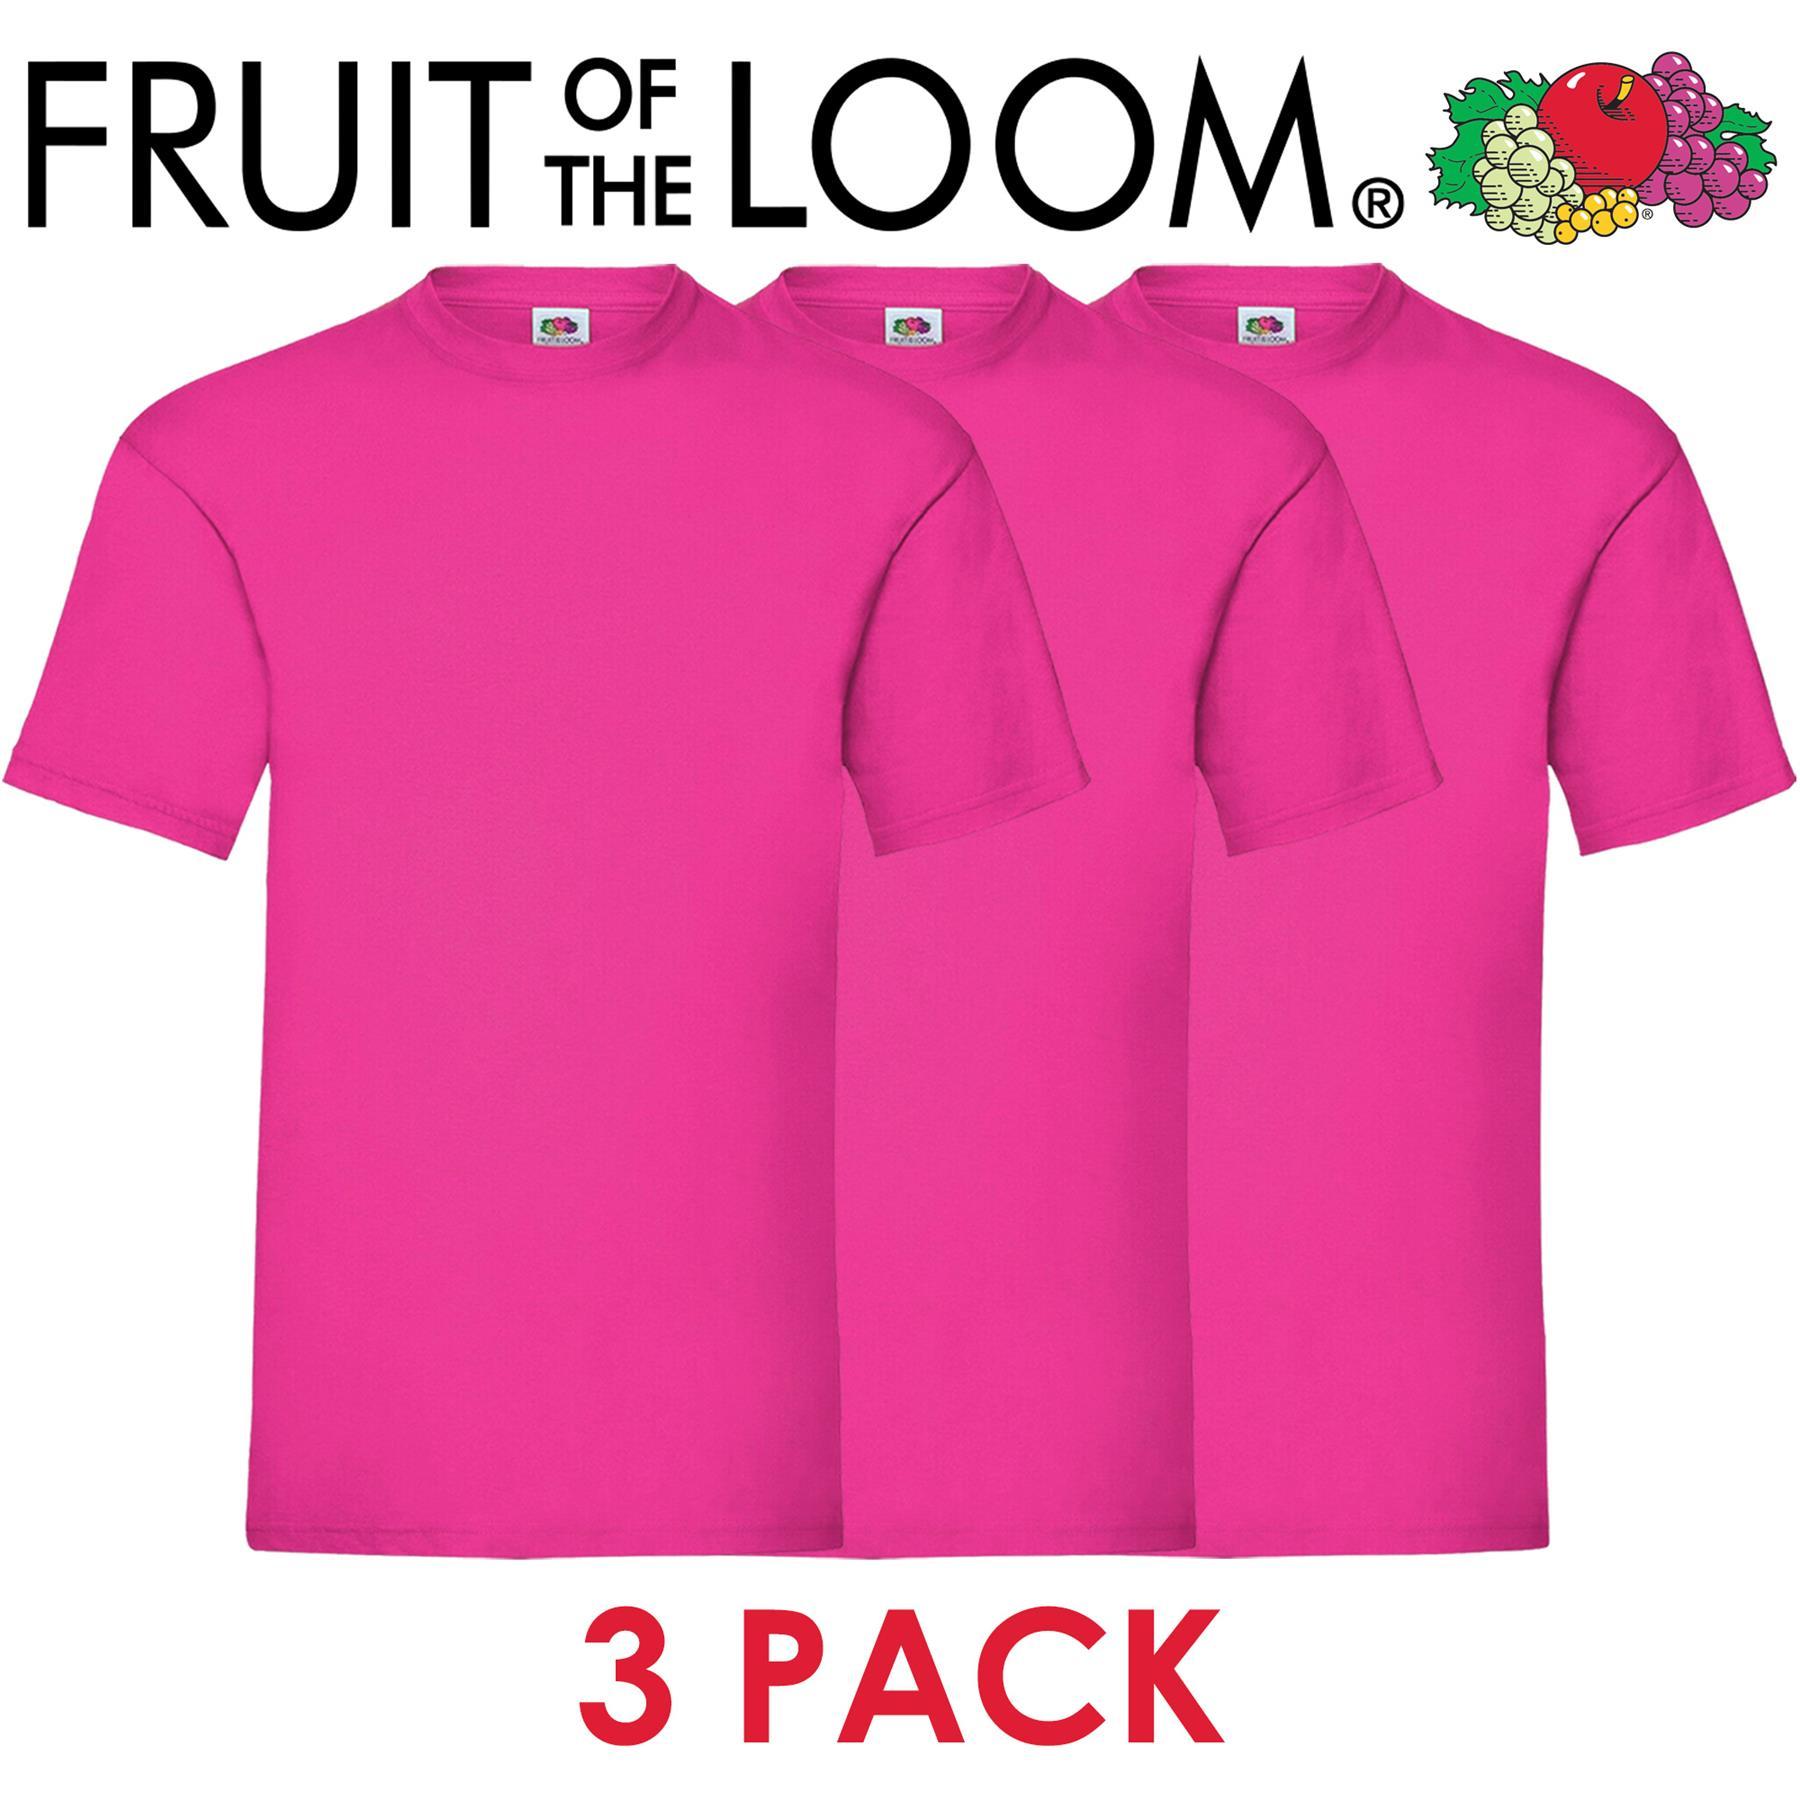 3-amp-5-Pack-Fruit-of-The-Loom-Mens-T-Shirts-100-Cotton-Plain-Short-Sleeve-Tee thumbnail 9